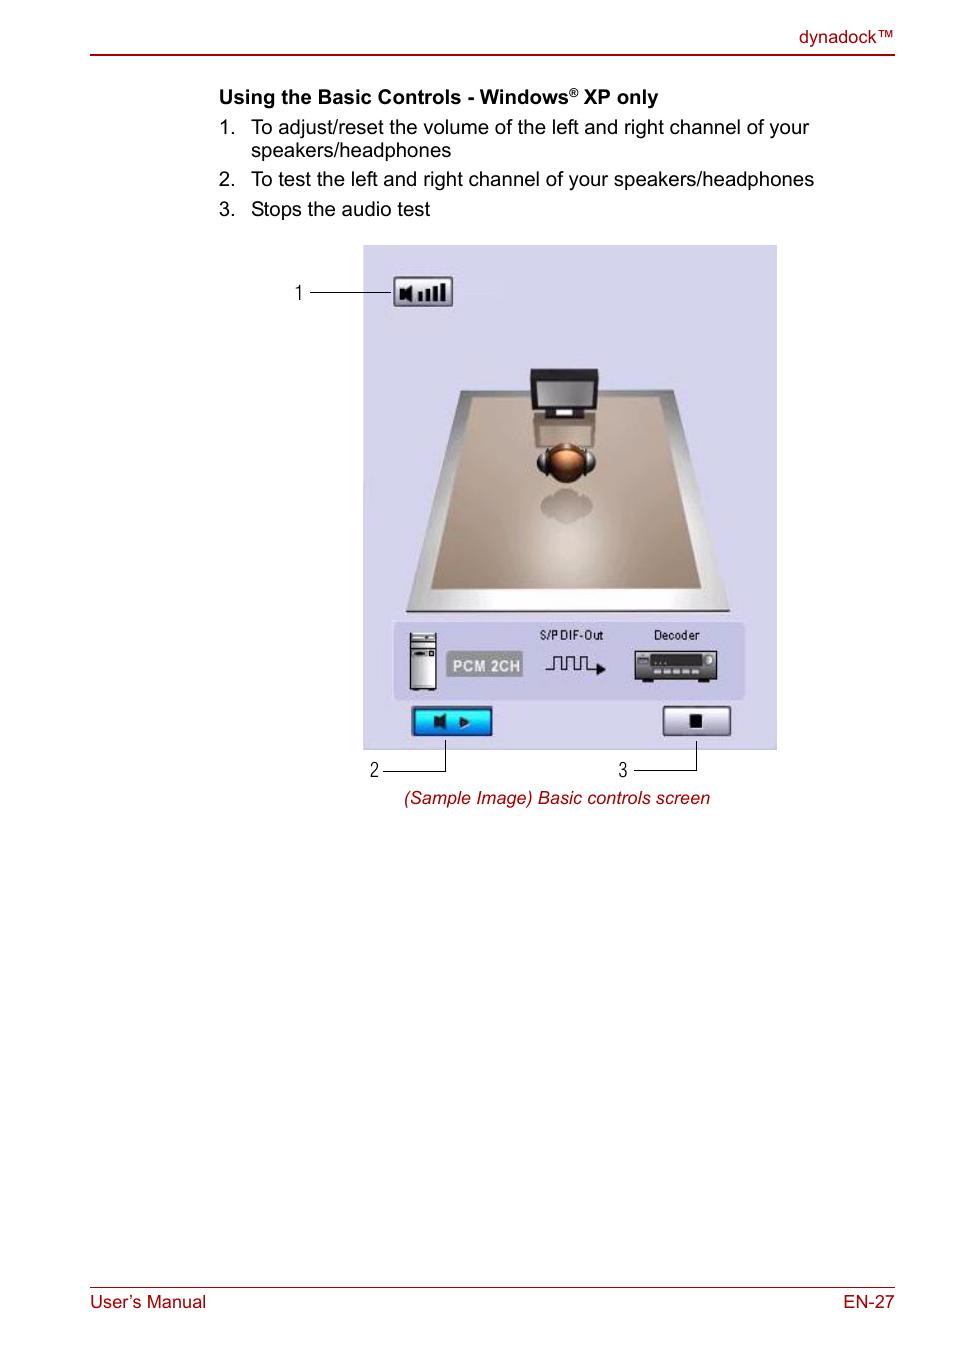 toshiba dynadock u10 user manual page 27 44 rh manualsdir com